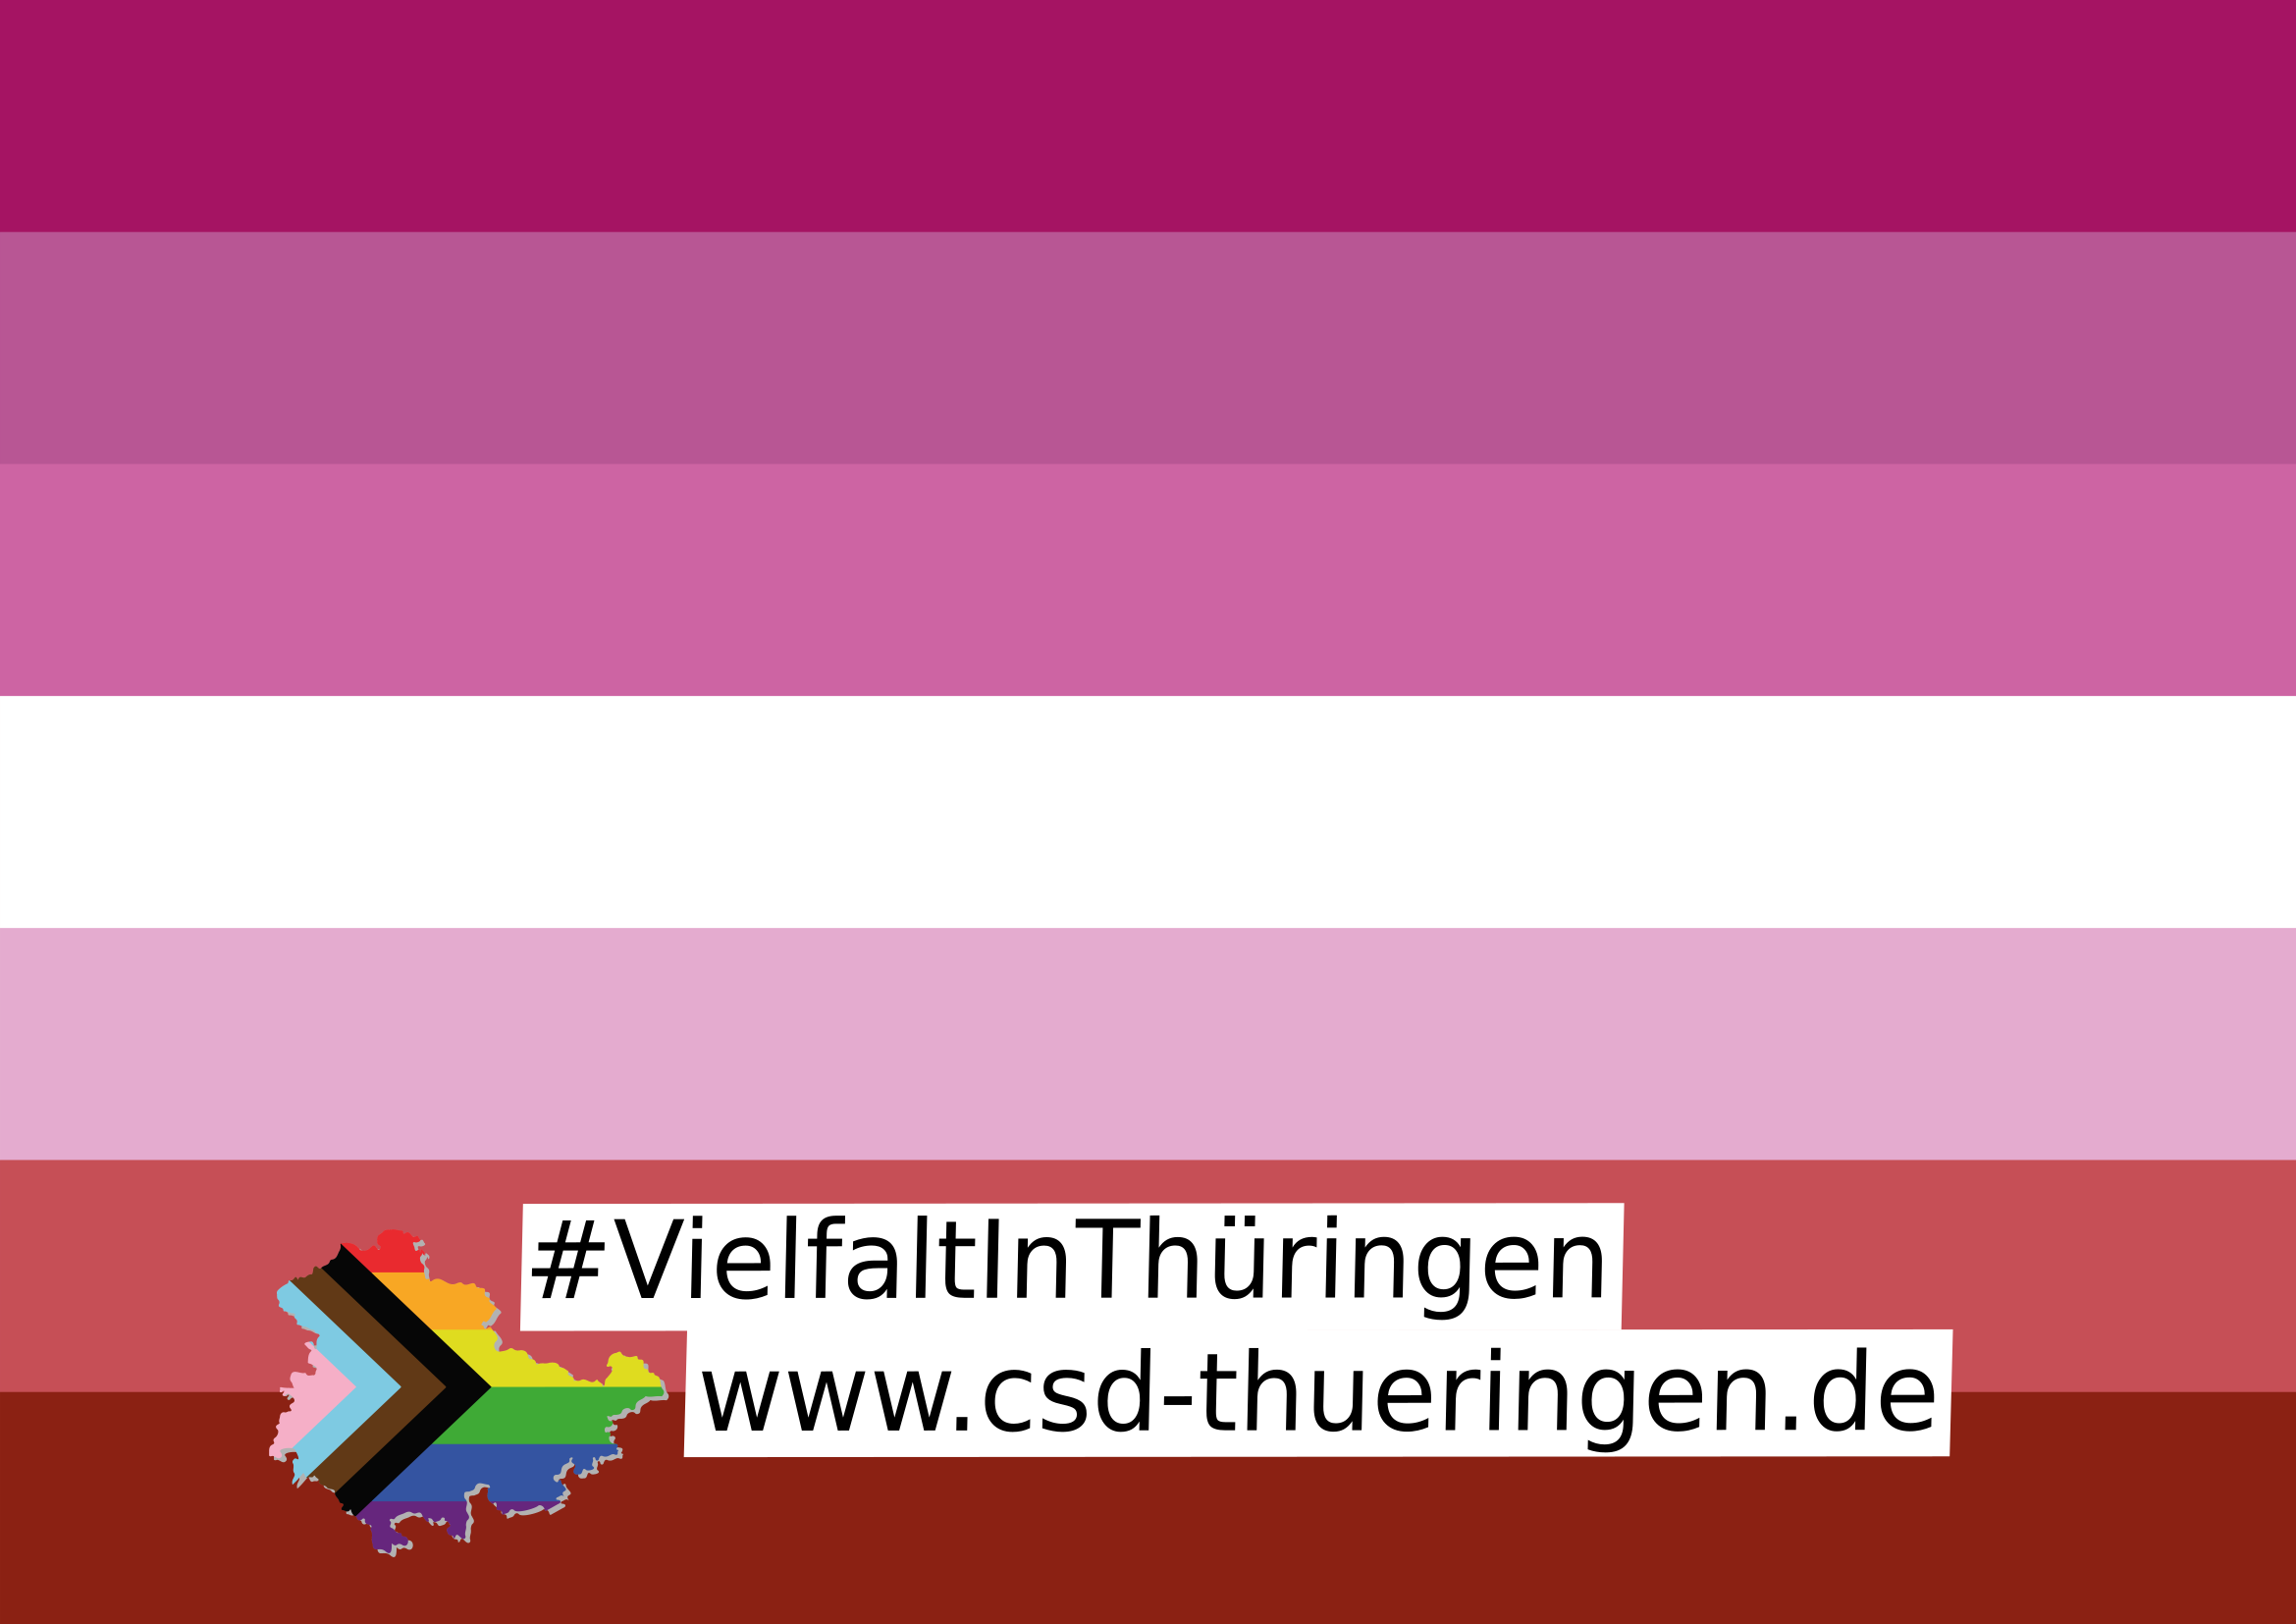 Lesbisch.png